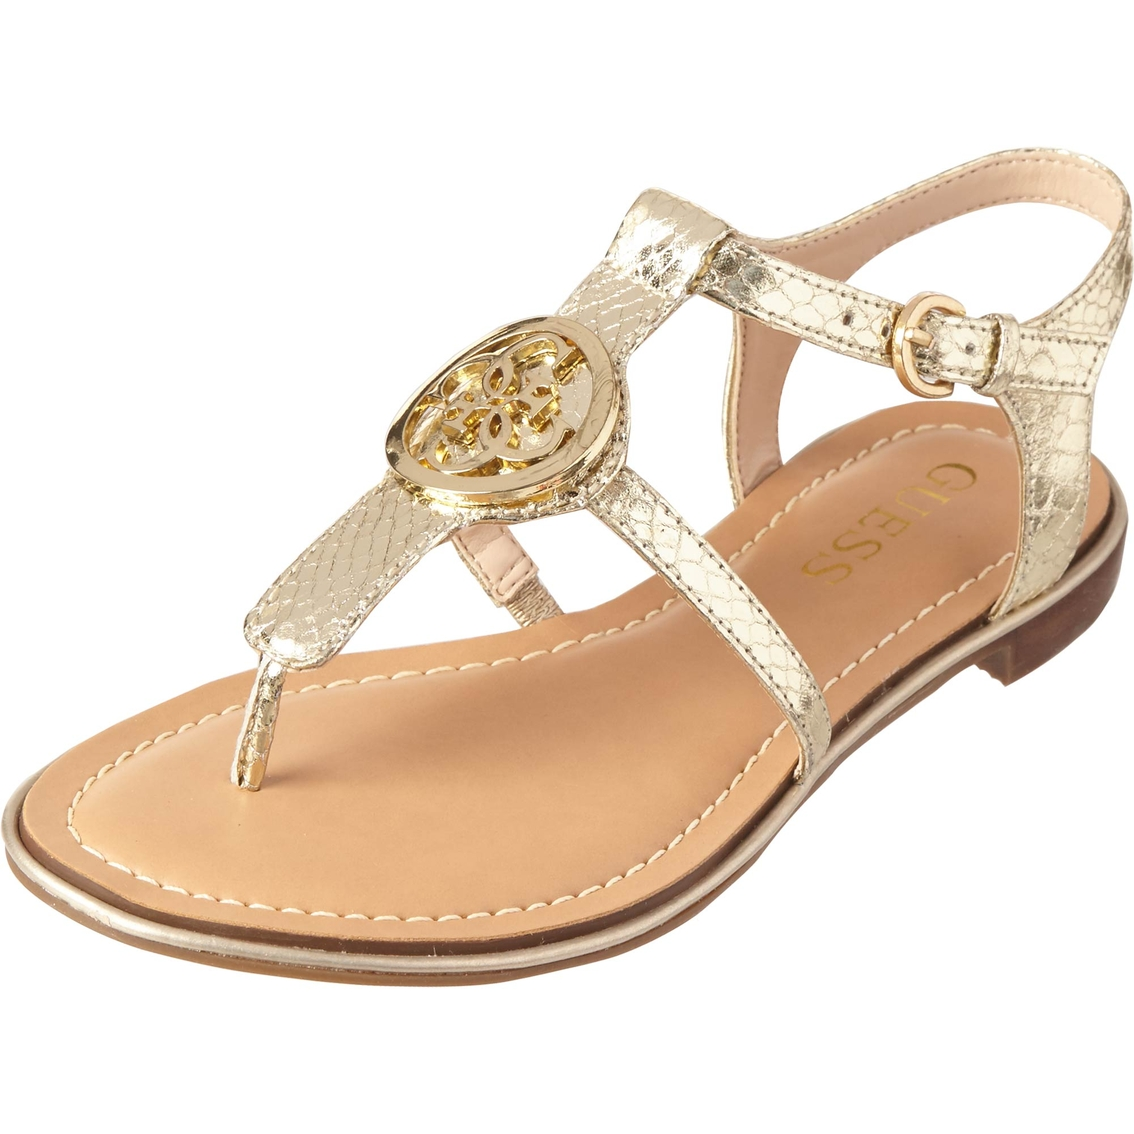 2ff533f078a Guess Roxxie Flat Medallion Sandals